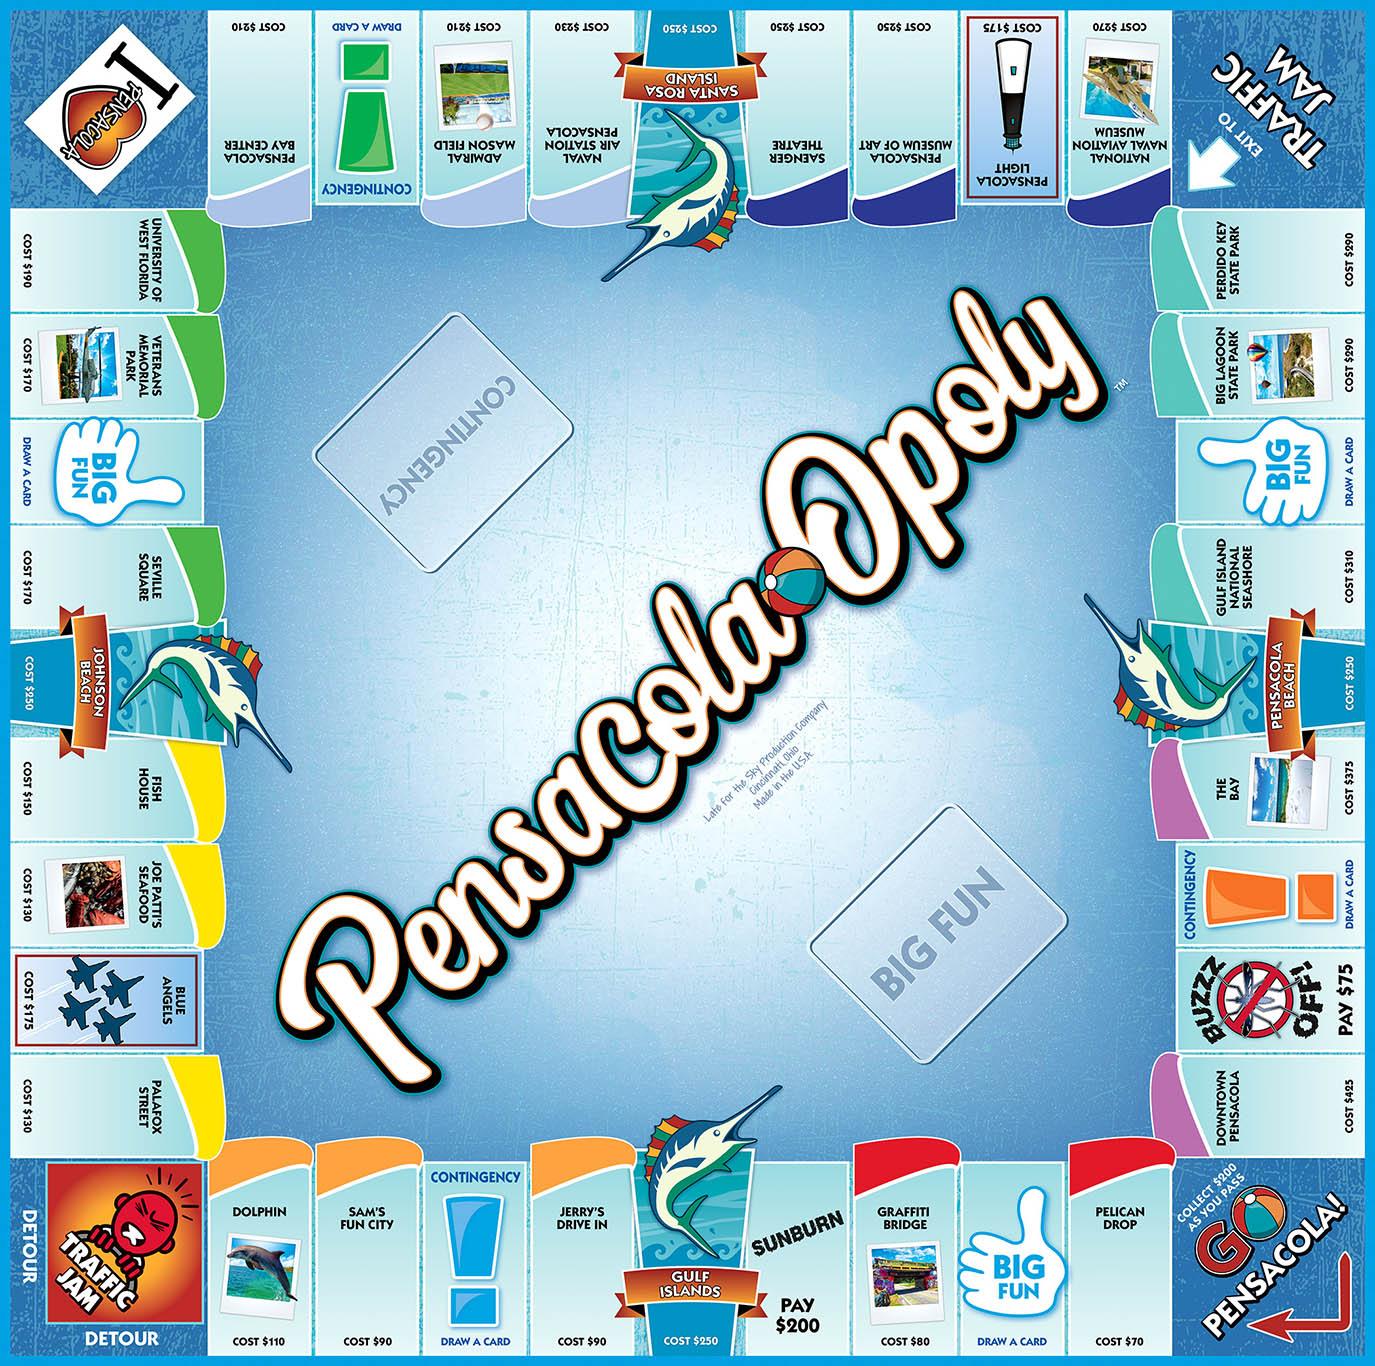 PENSACOLA-OPOLY Board Game